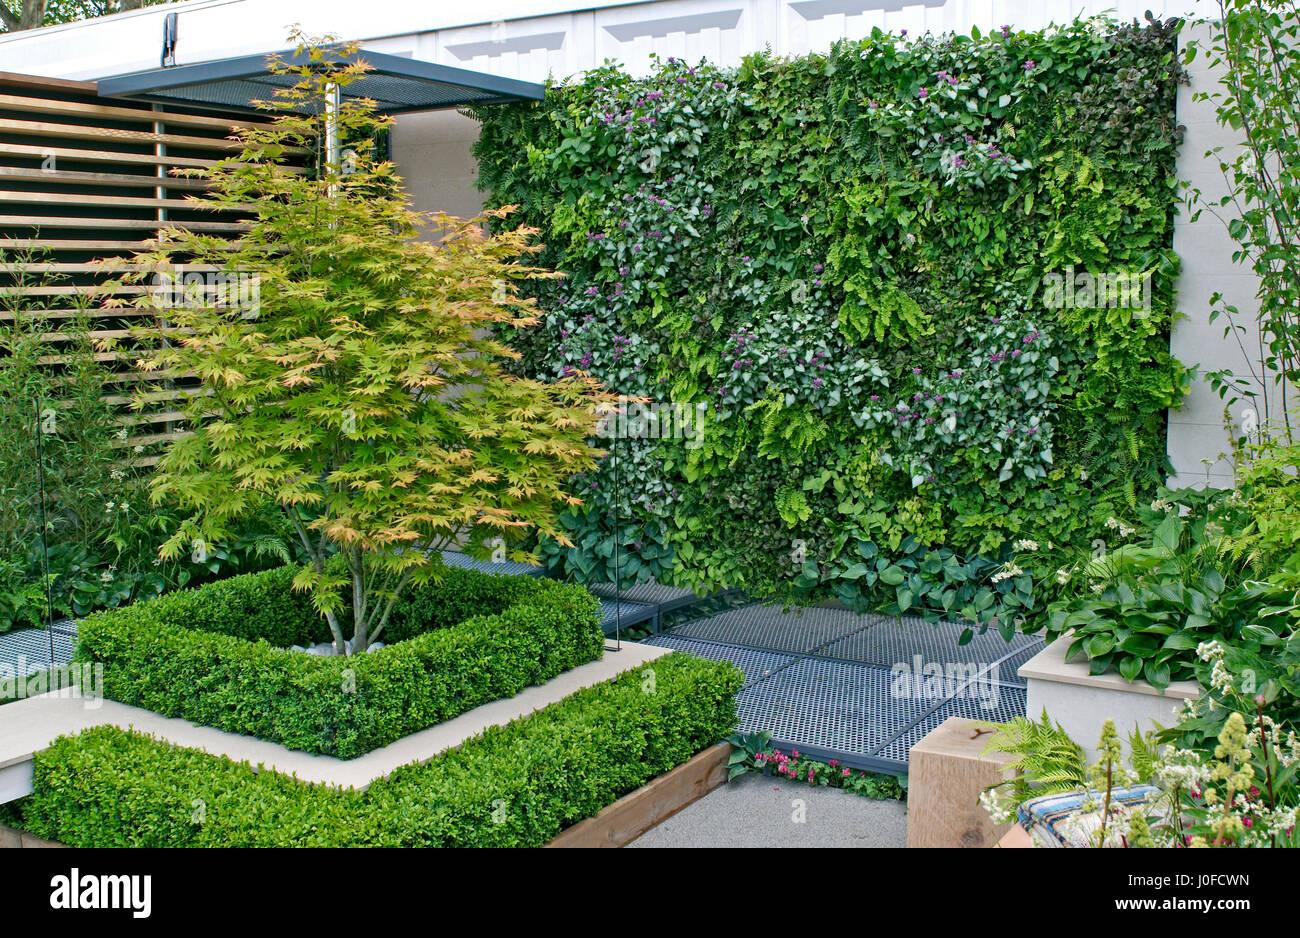 A Small Urban Environmental Eco Garden With A Living Plant Wall Stock Photo Alamy